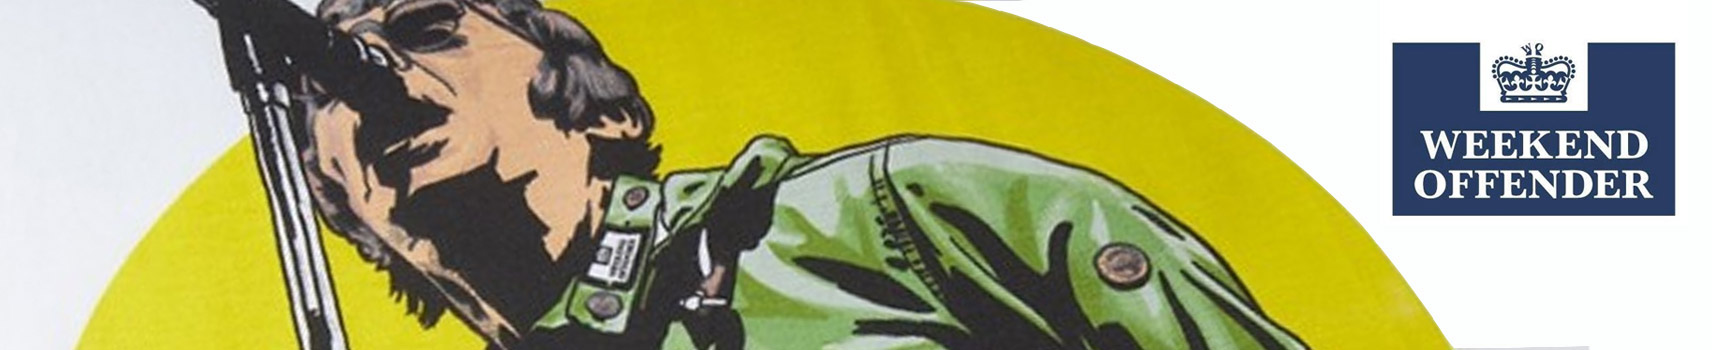 Weekend offender banner